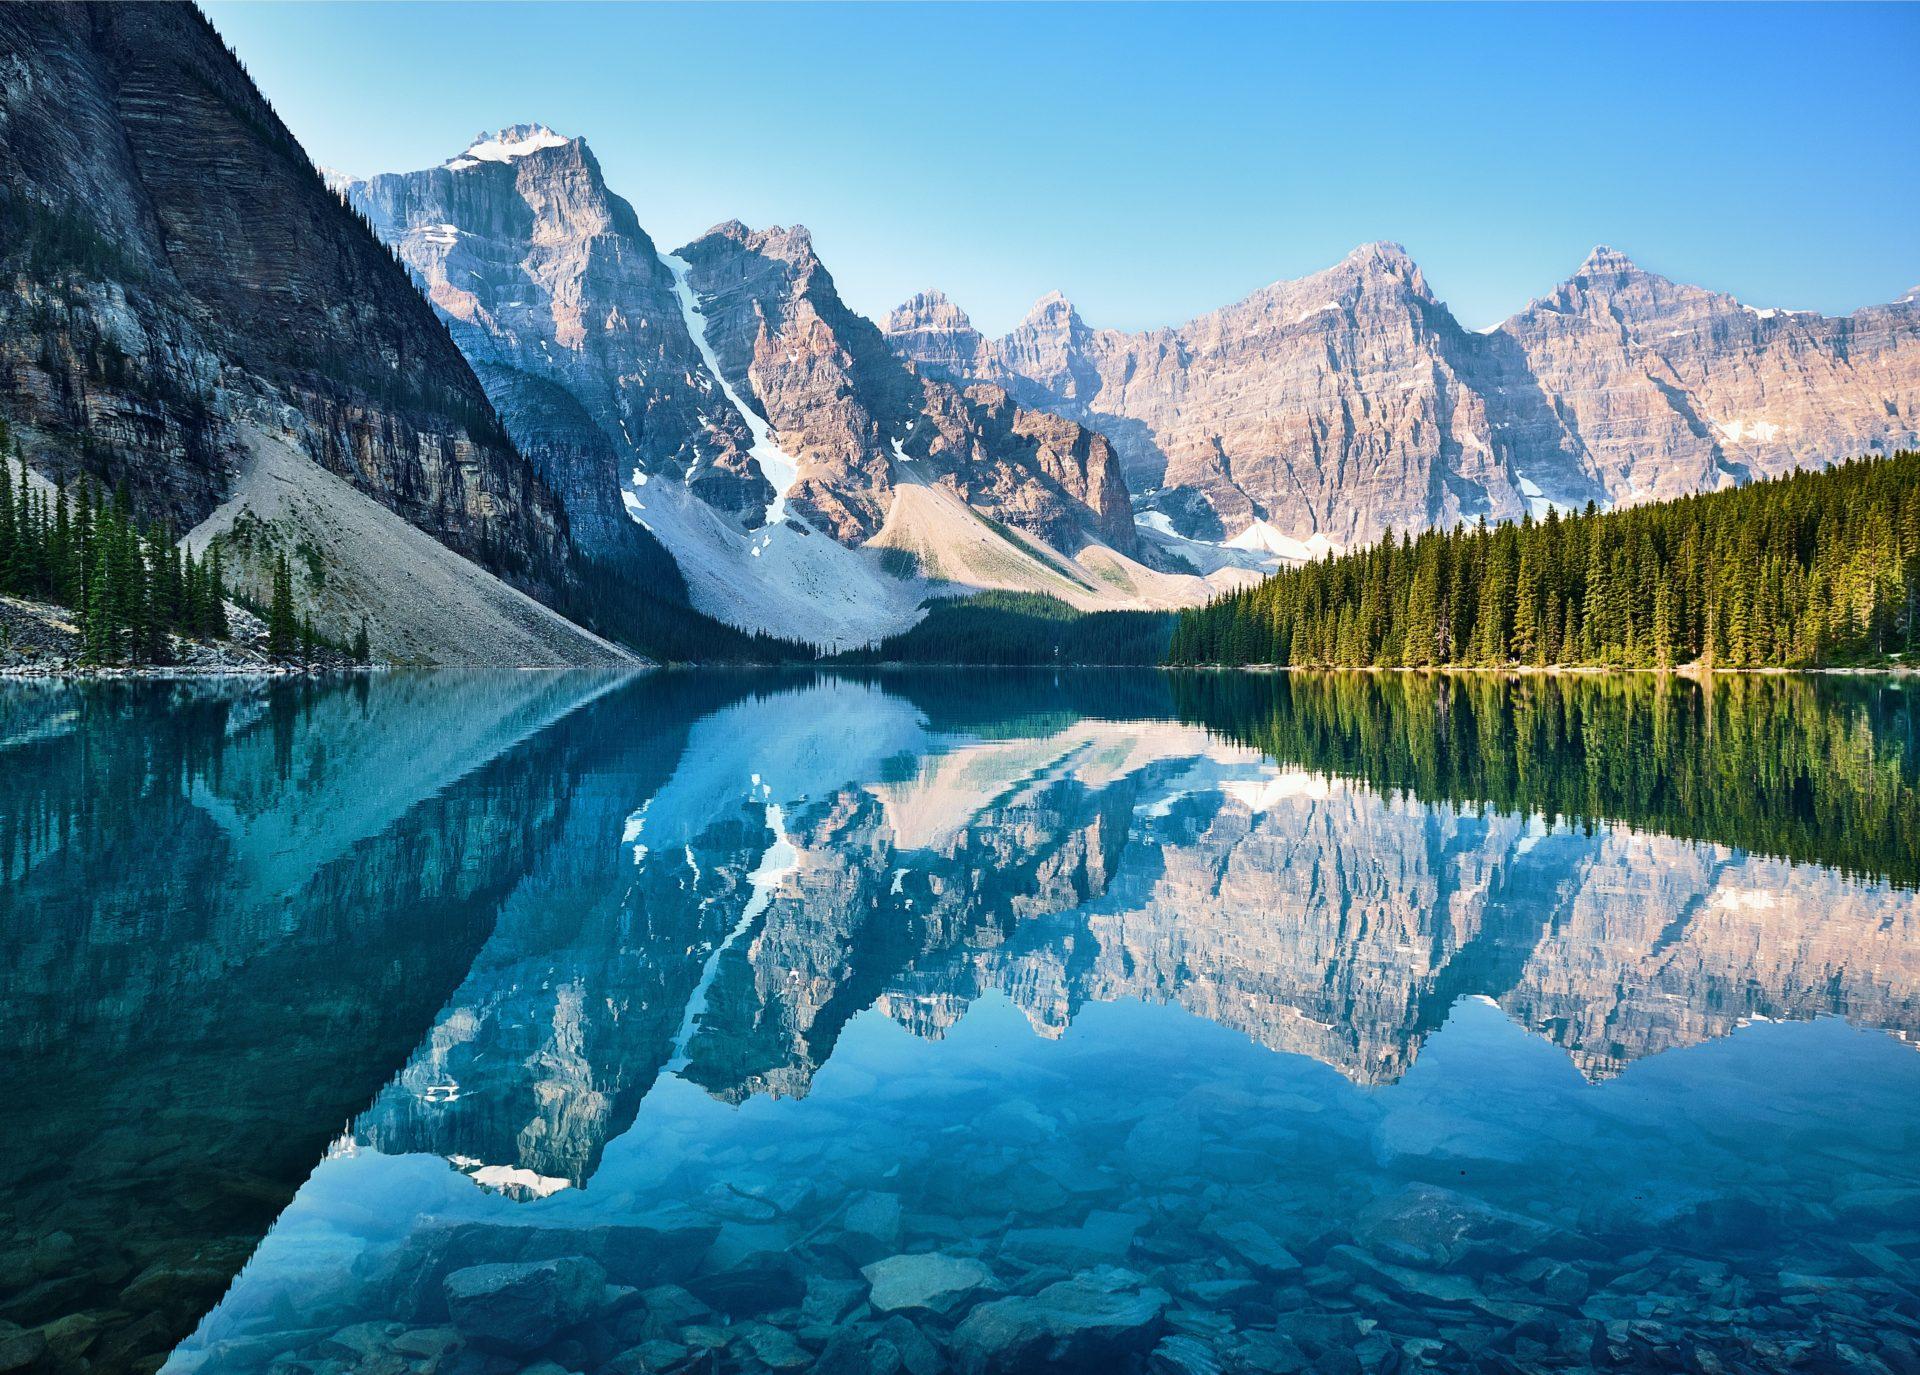 canadian mountains next to lake